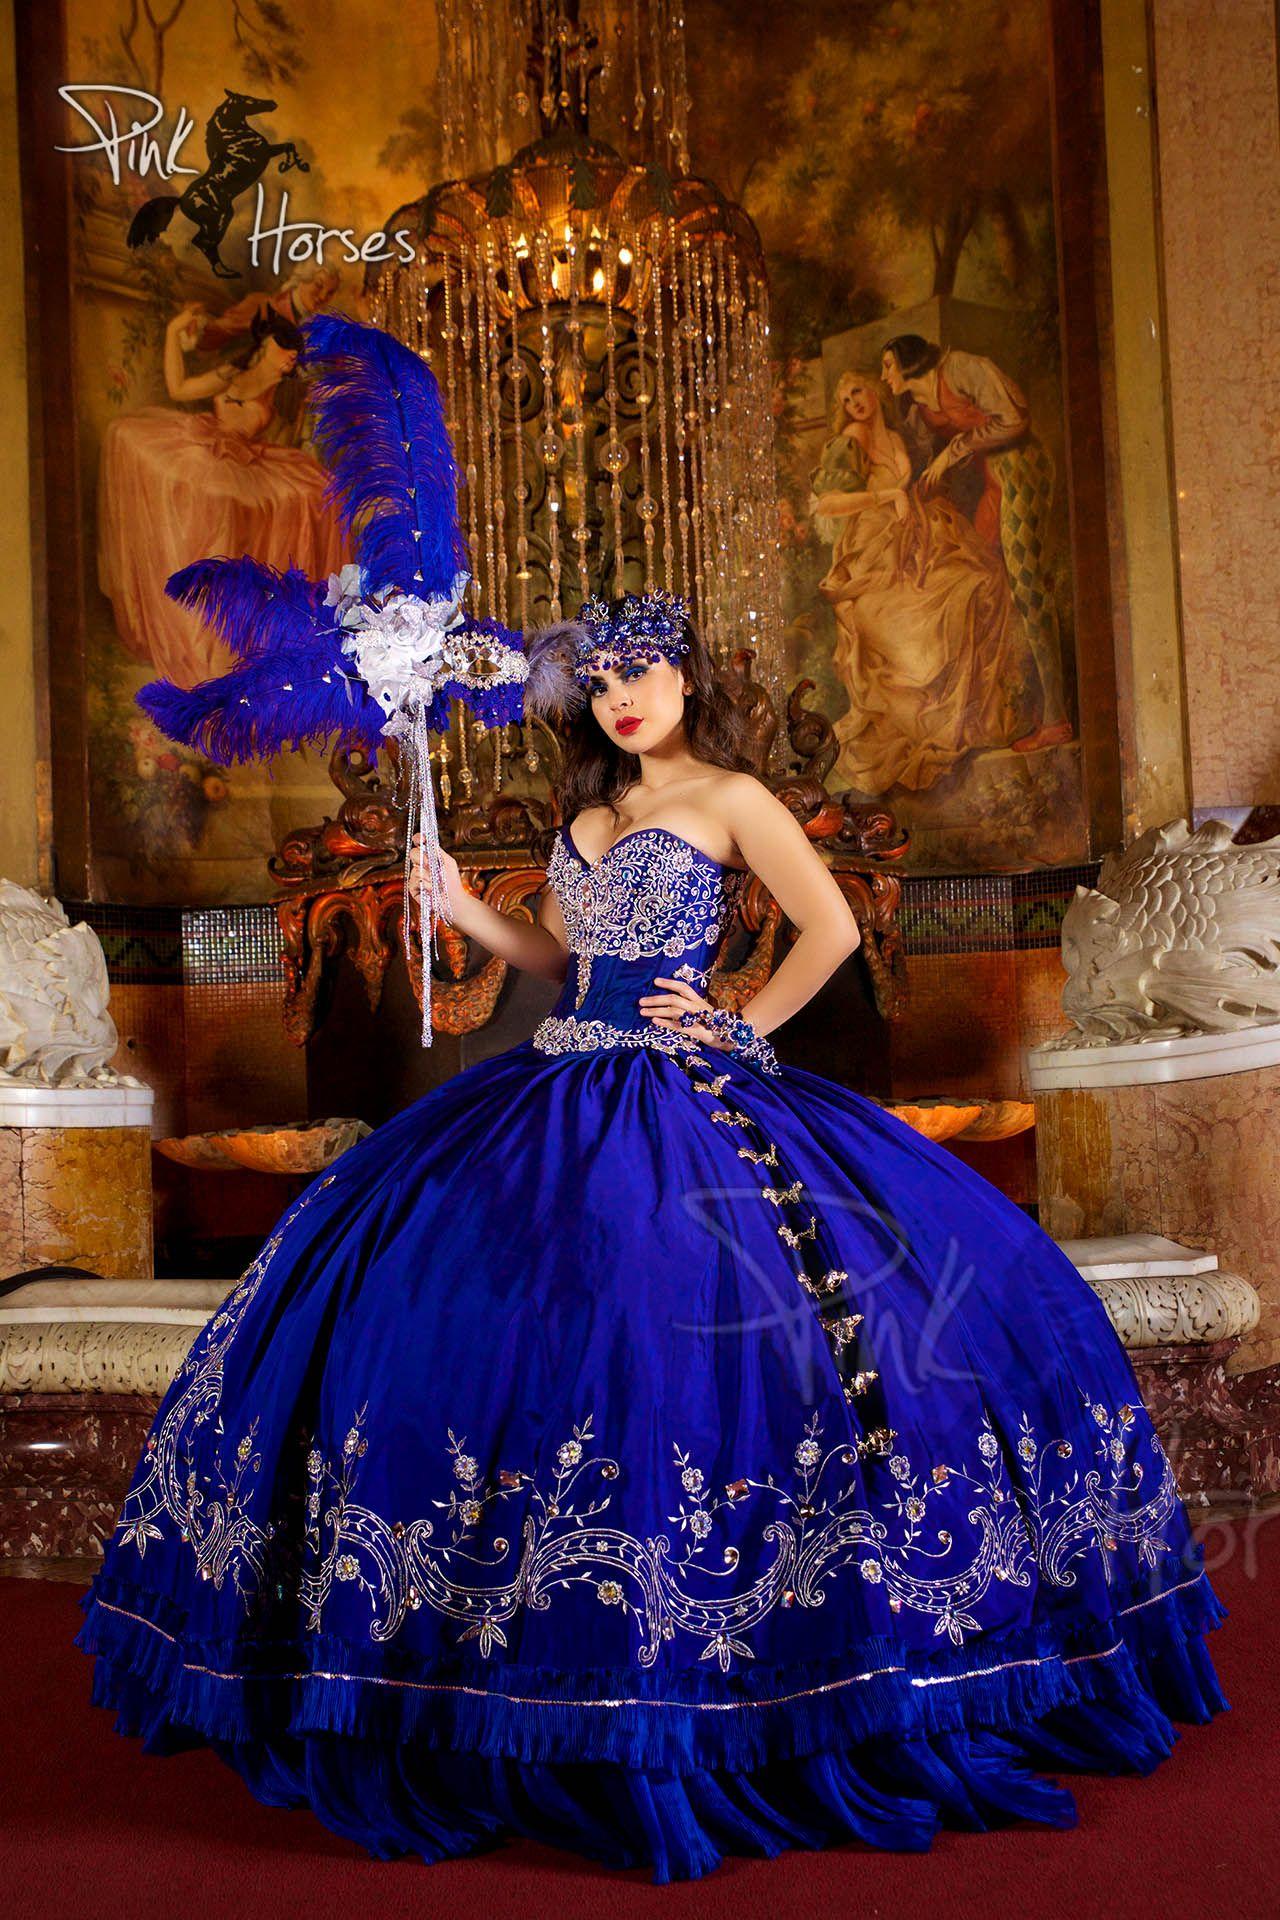 Gallery – Women   Pinkhorses   charra mexicana   Pinterest ...